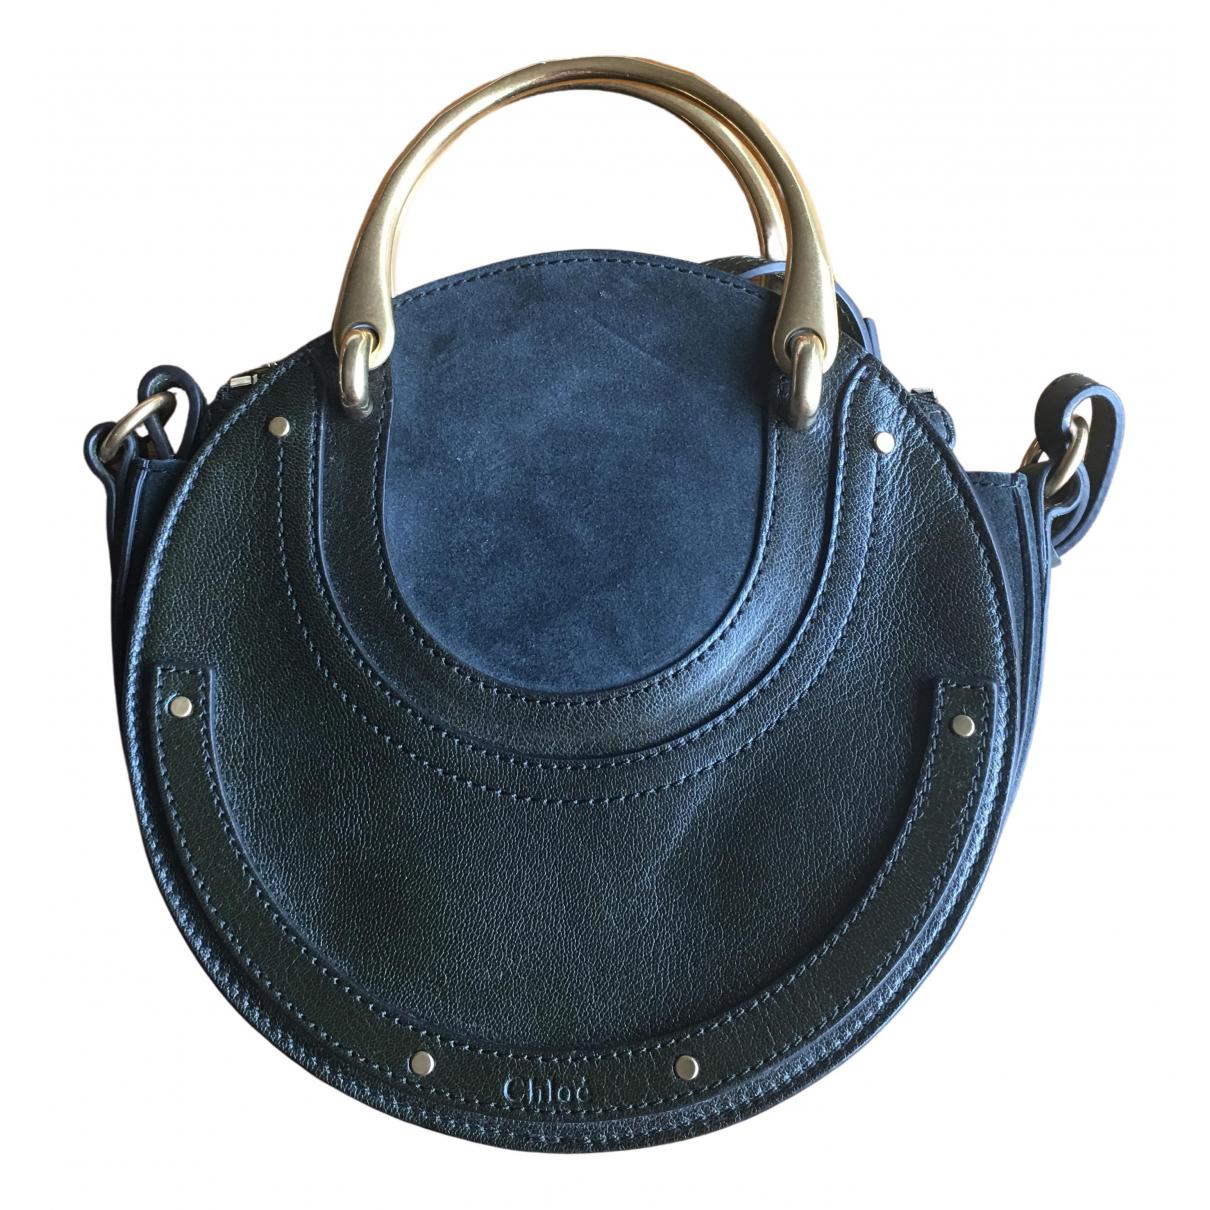 Chloé Pixie Khaki Leather handbag for Women N